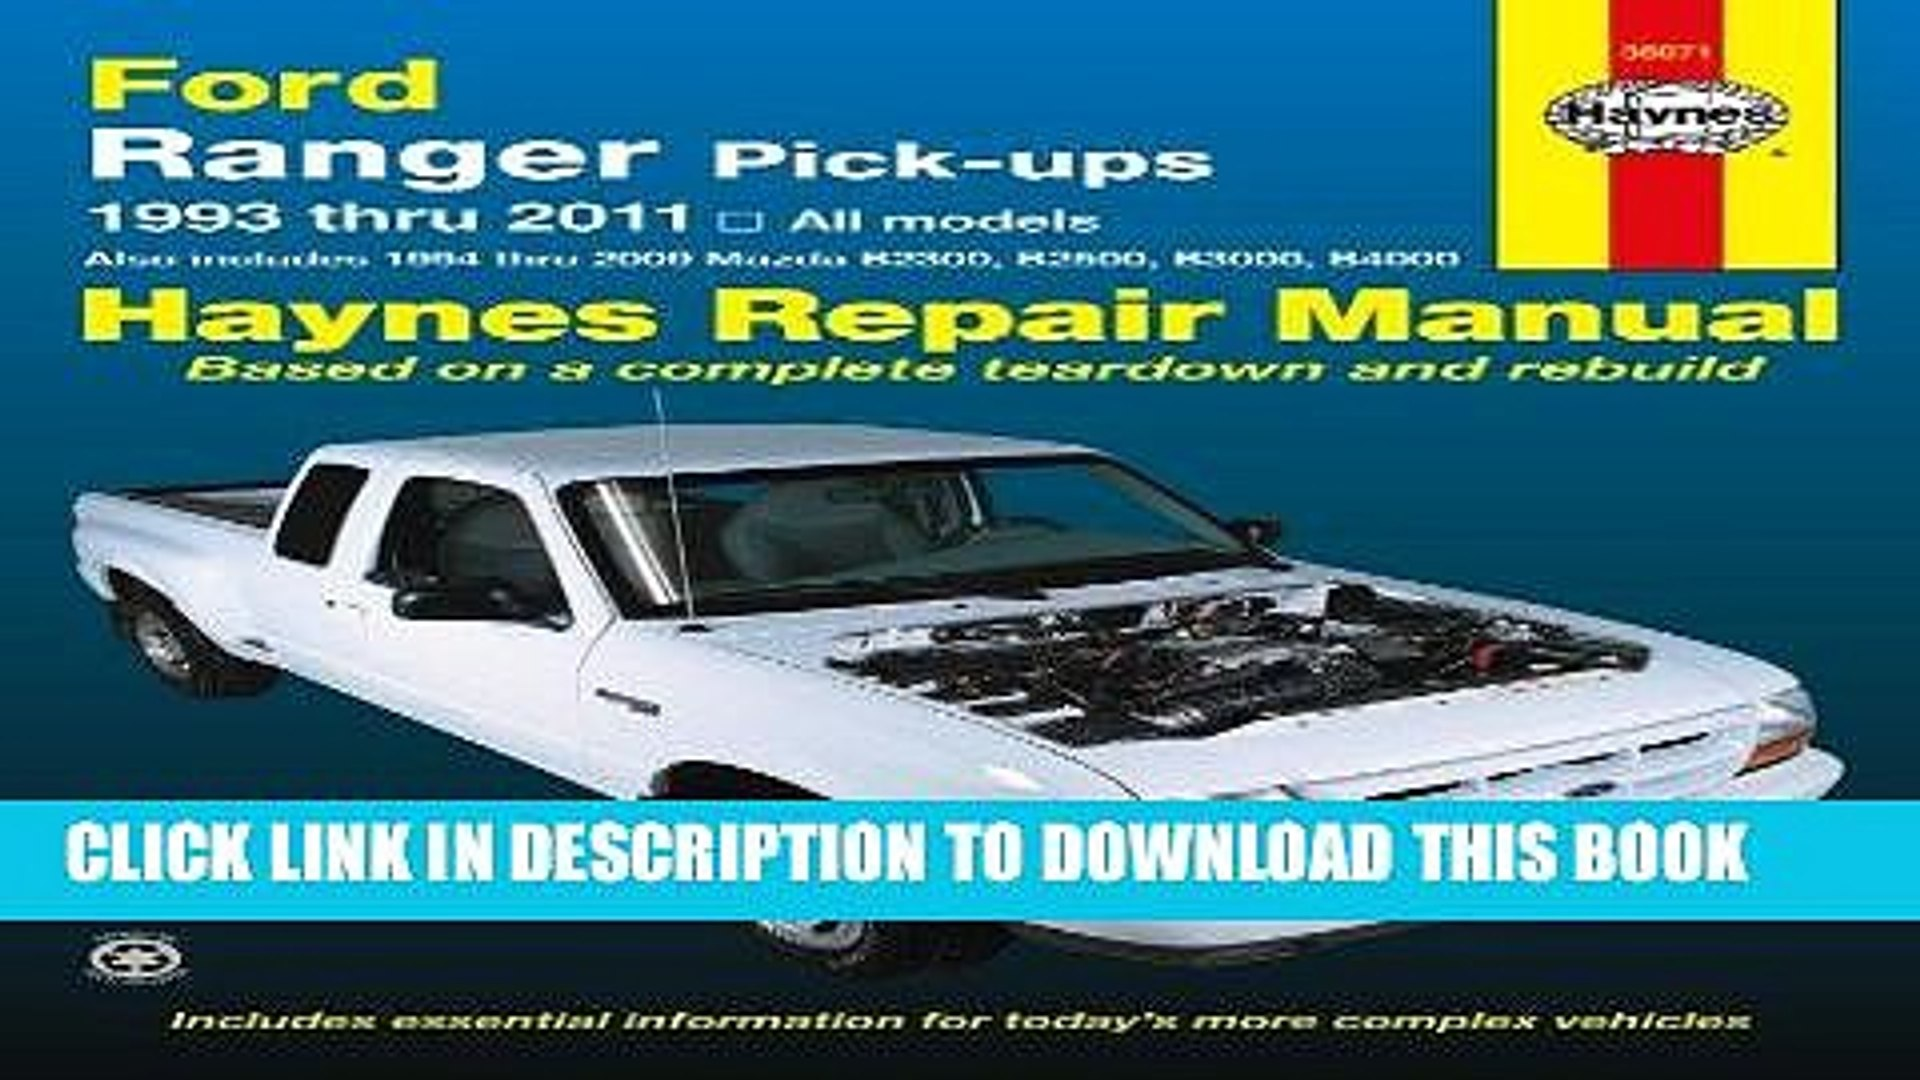 [Ebook] Ford Ranger Pick-ups 1993 thru 2011: 1993 thru 2011 all models - Also includes 1994 thru